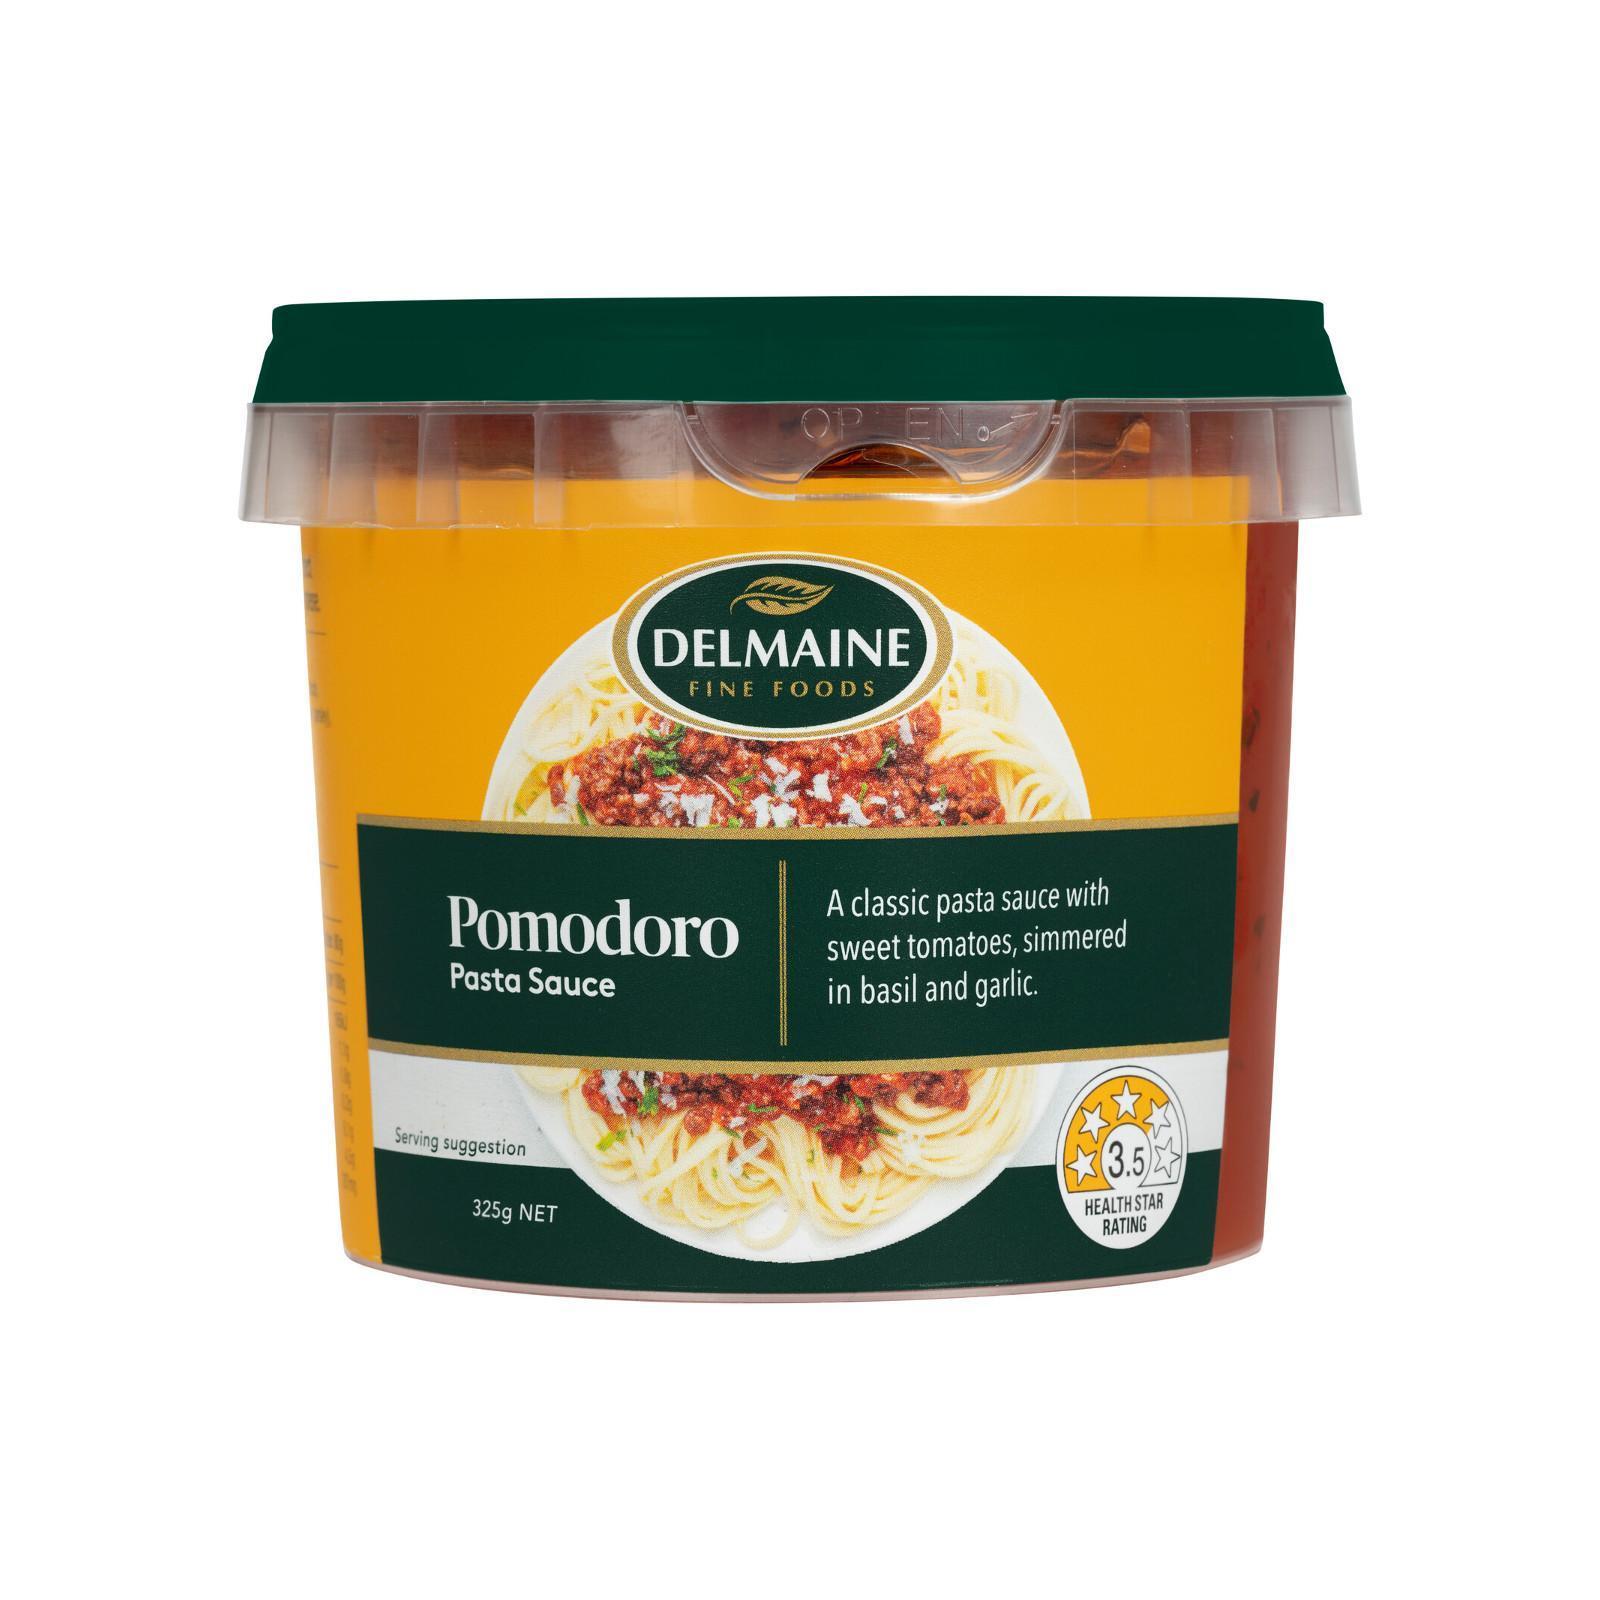 Delmaine Pomodoro Fresh Pasta Sauce